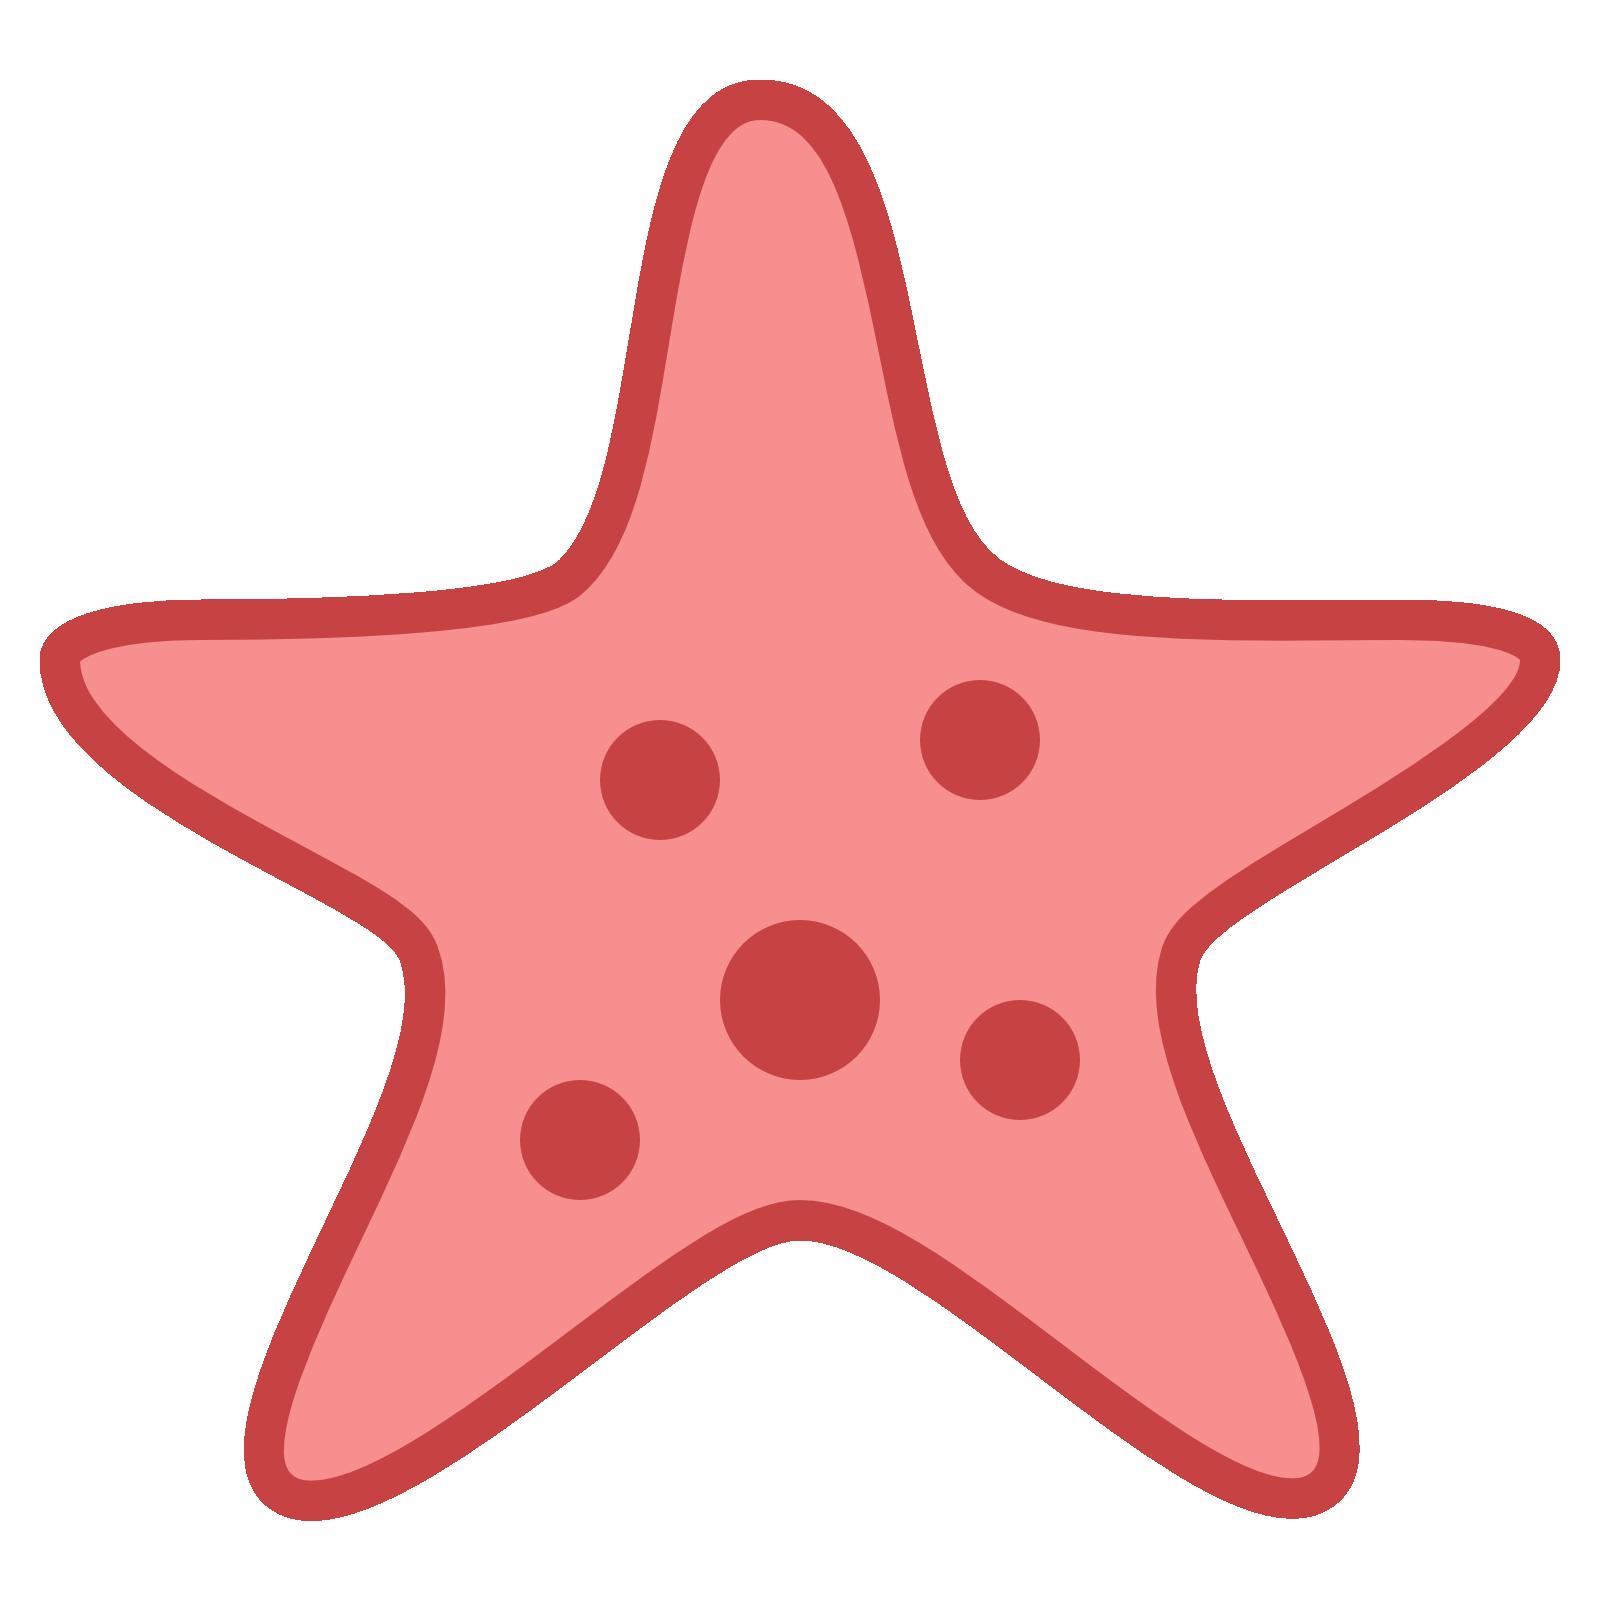 Морская звезда PNG